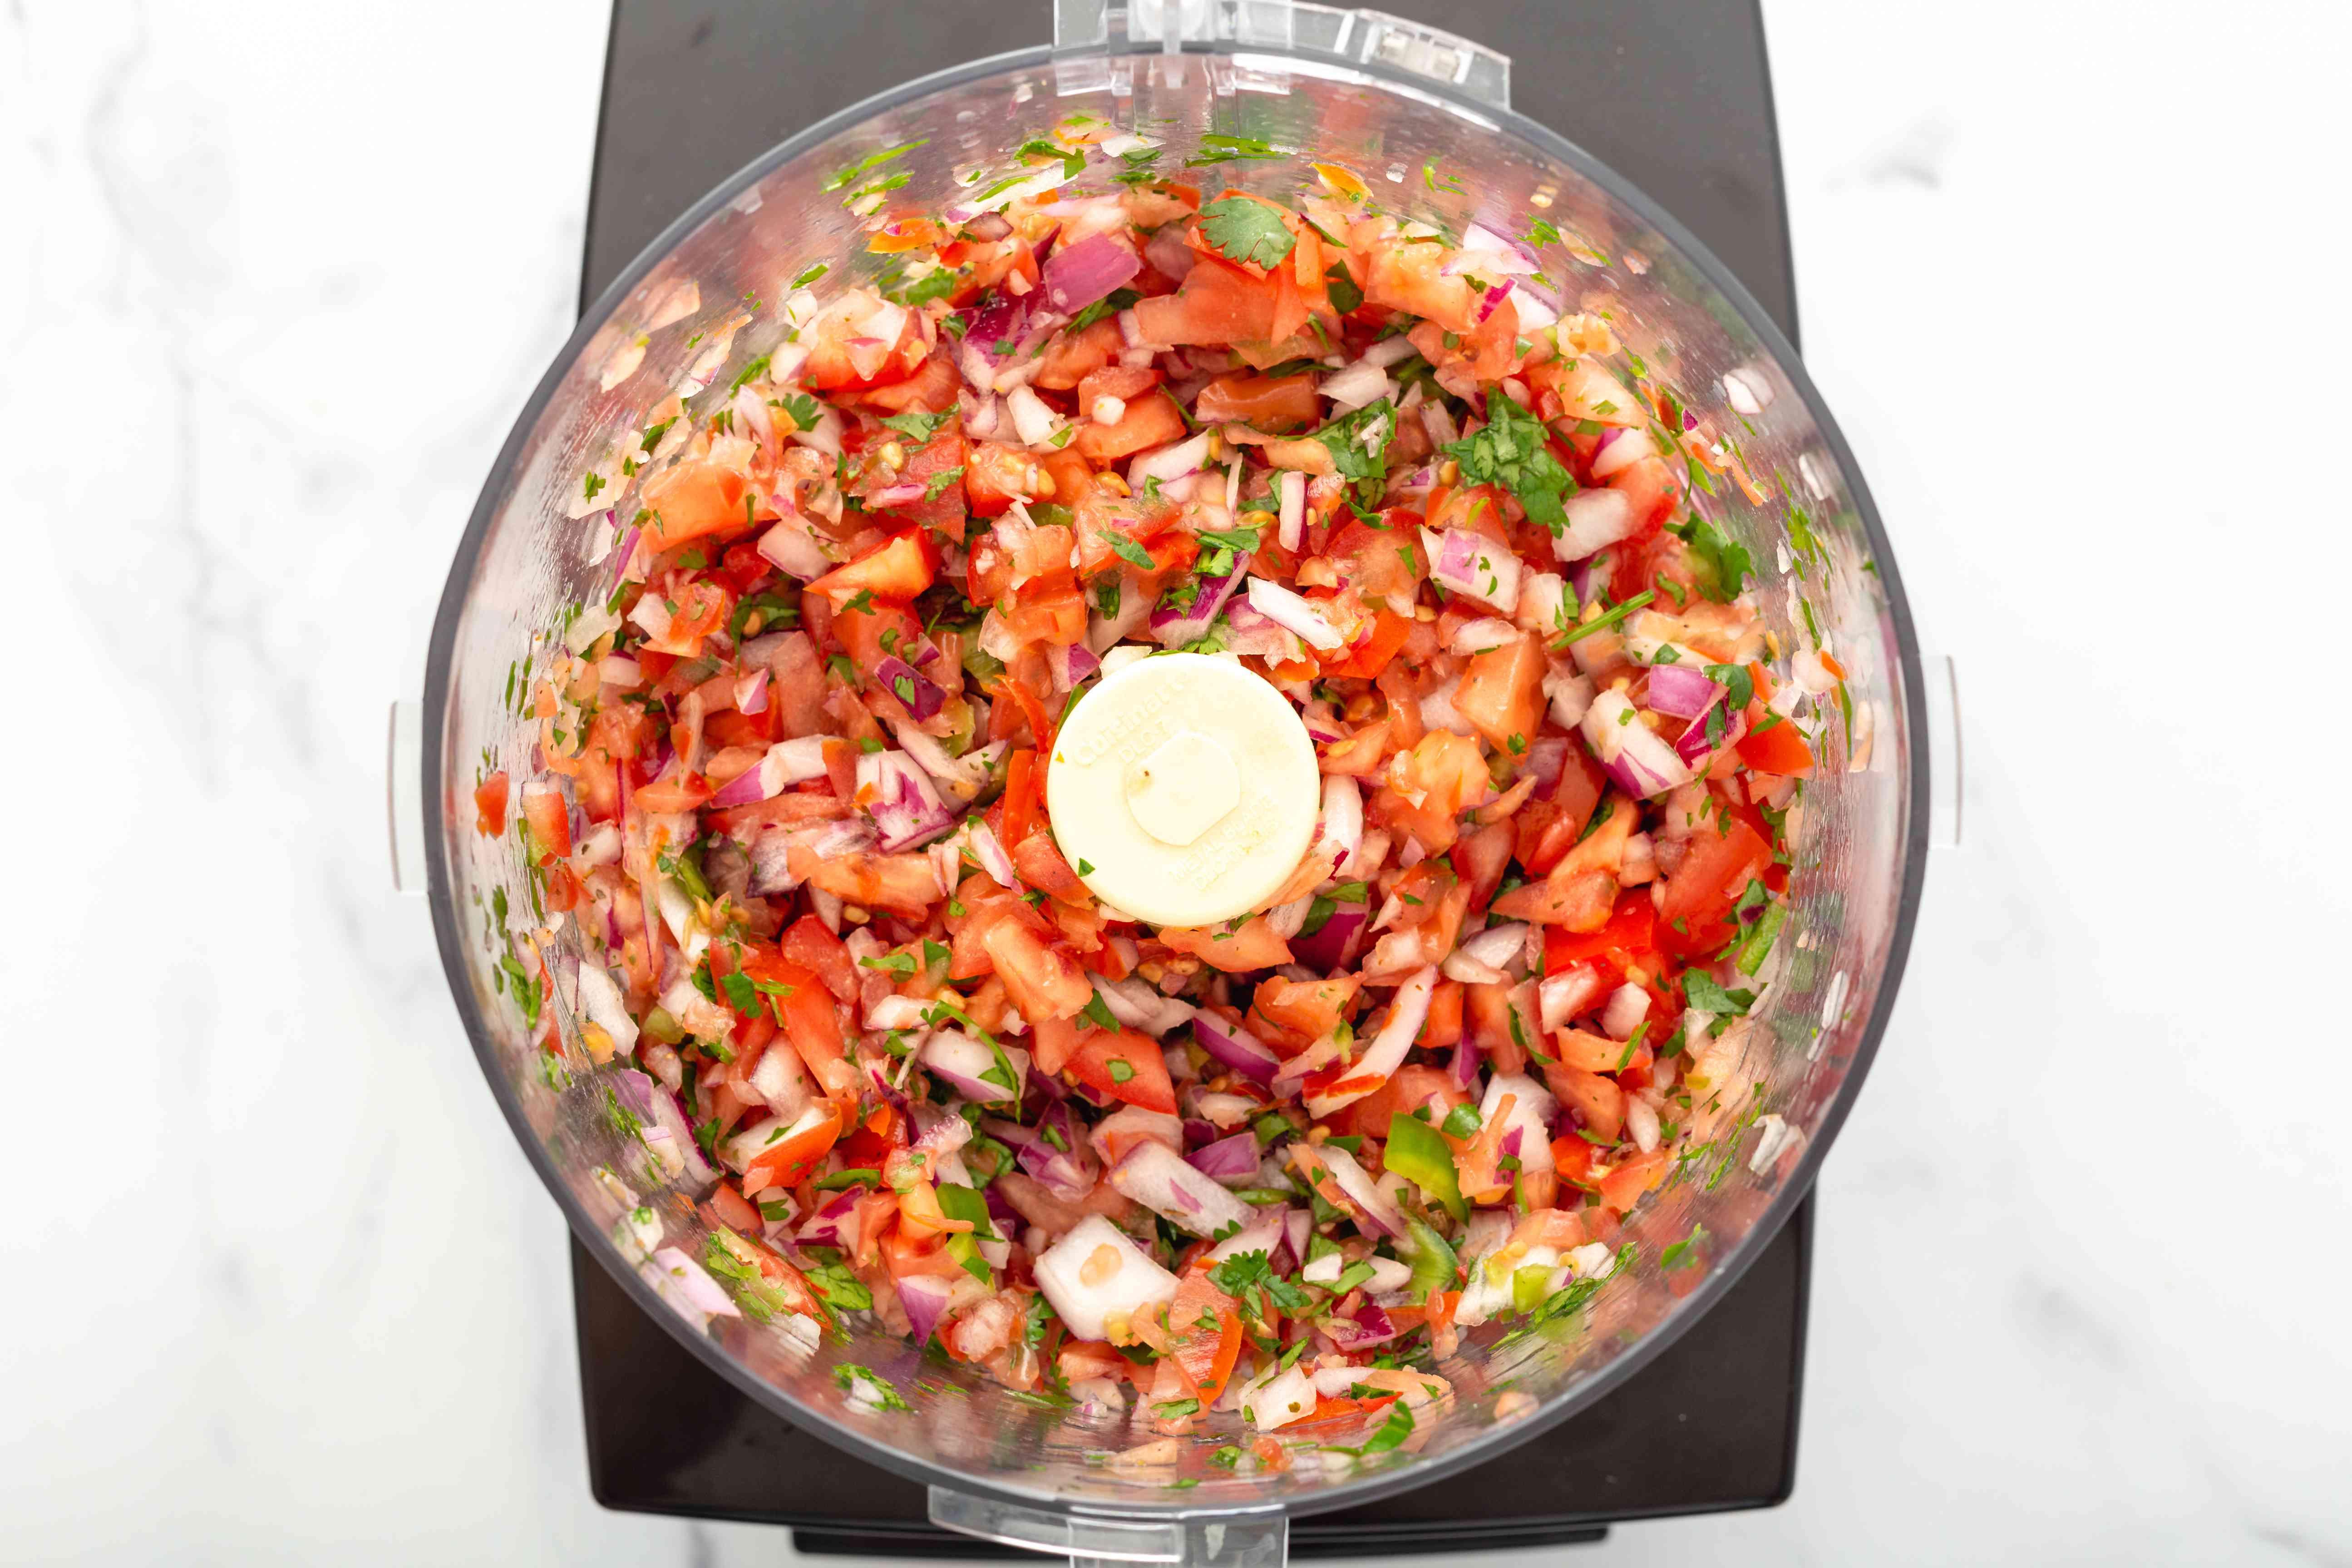 Food processor with pico de gallo inside.